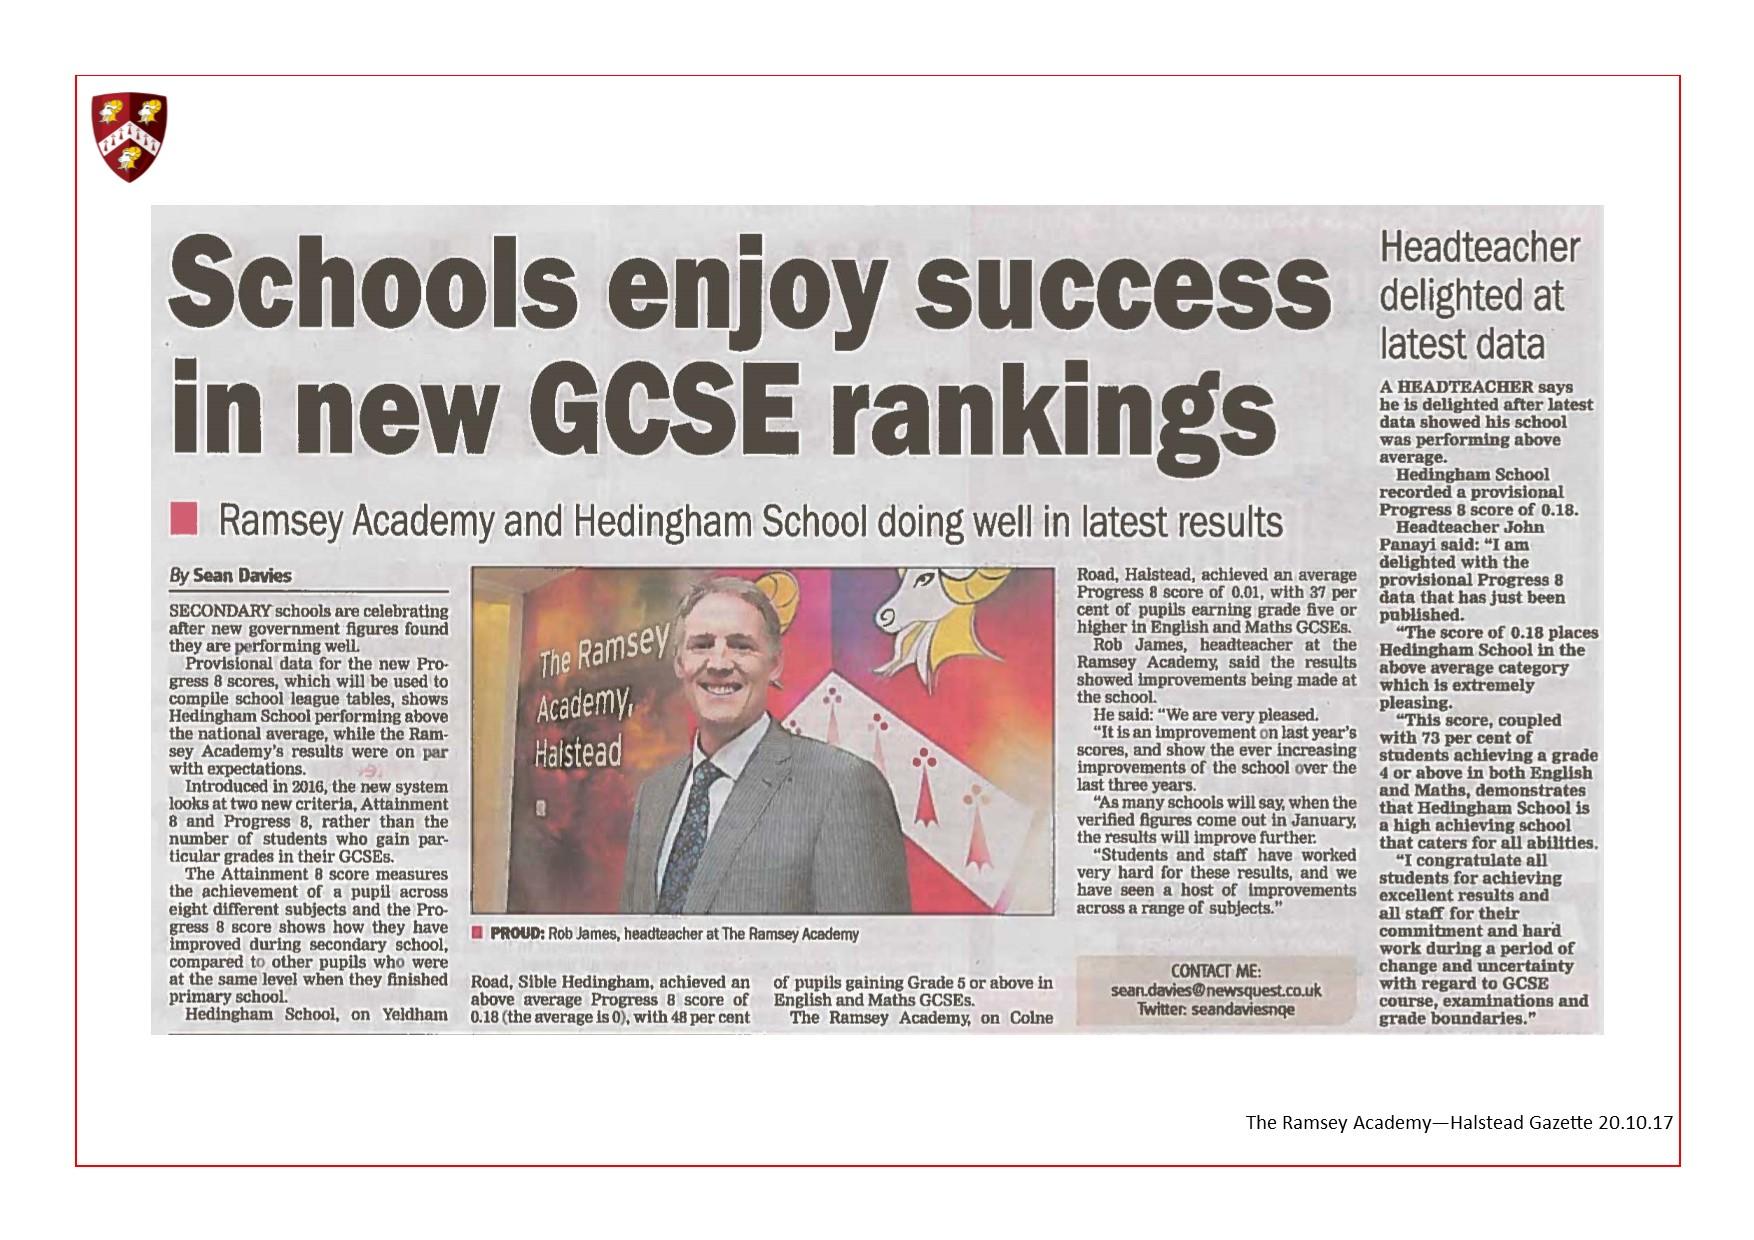 Schools Enjoy Success in New GCSE Rankings 20.10.17